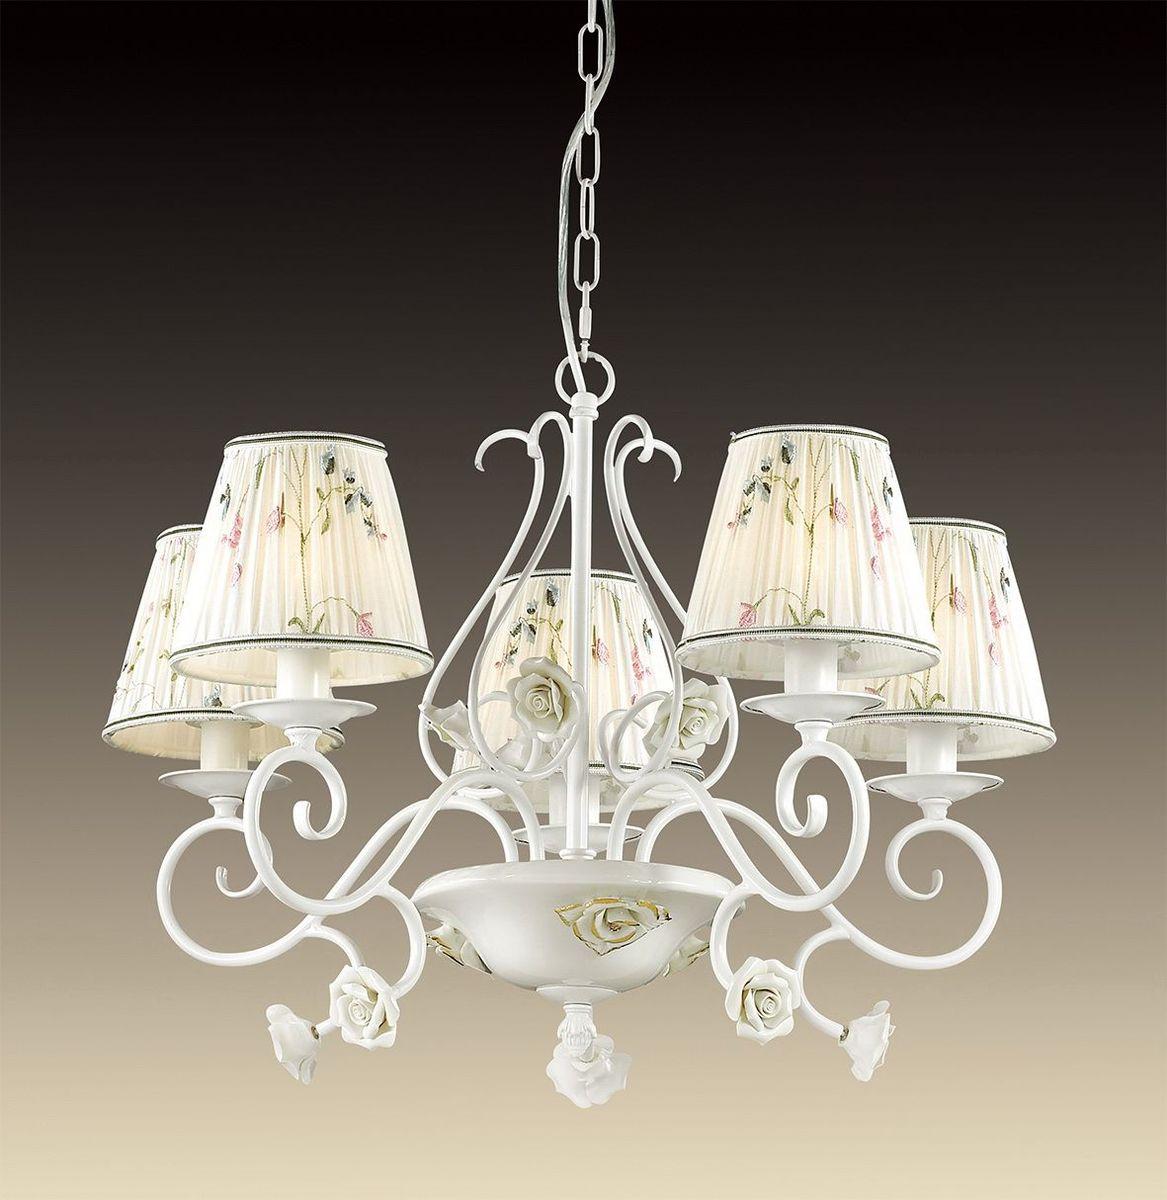 Люстра подвесная Odeon Light Montala, 5 х E14, 60W. 2886/52886/5